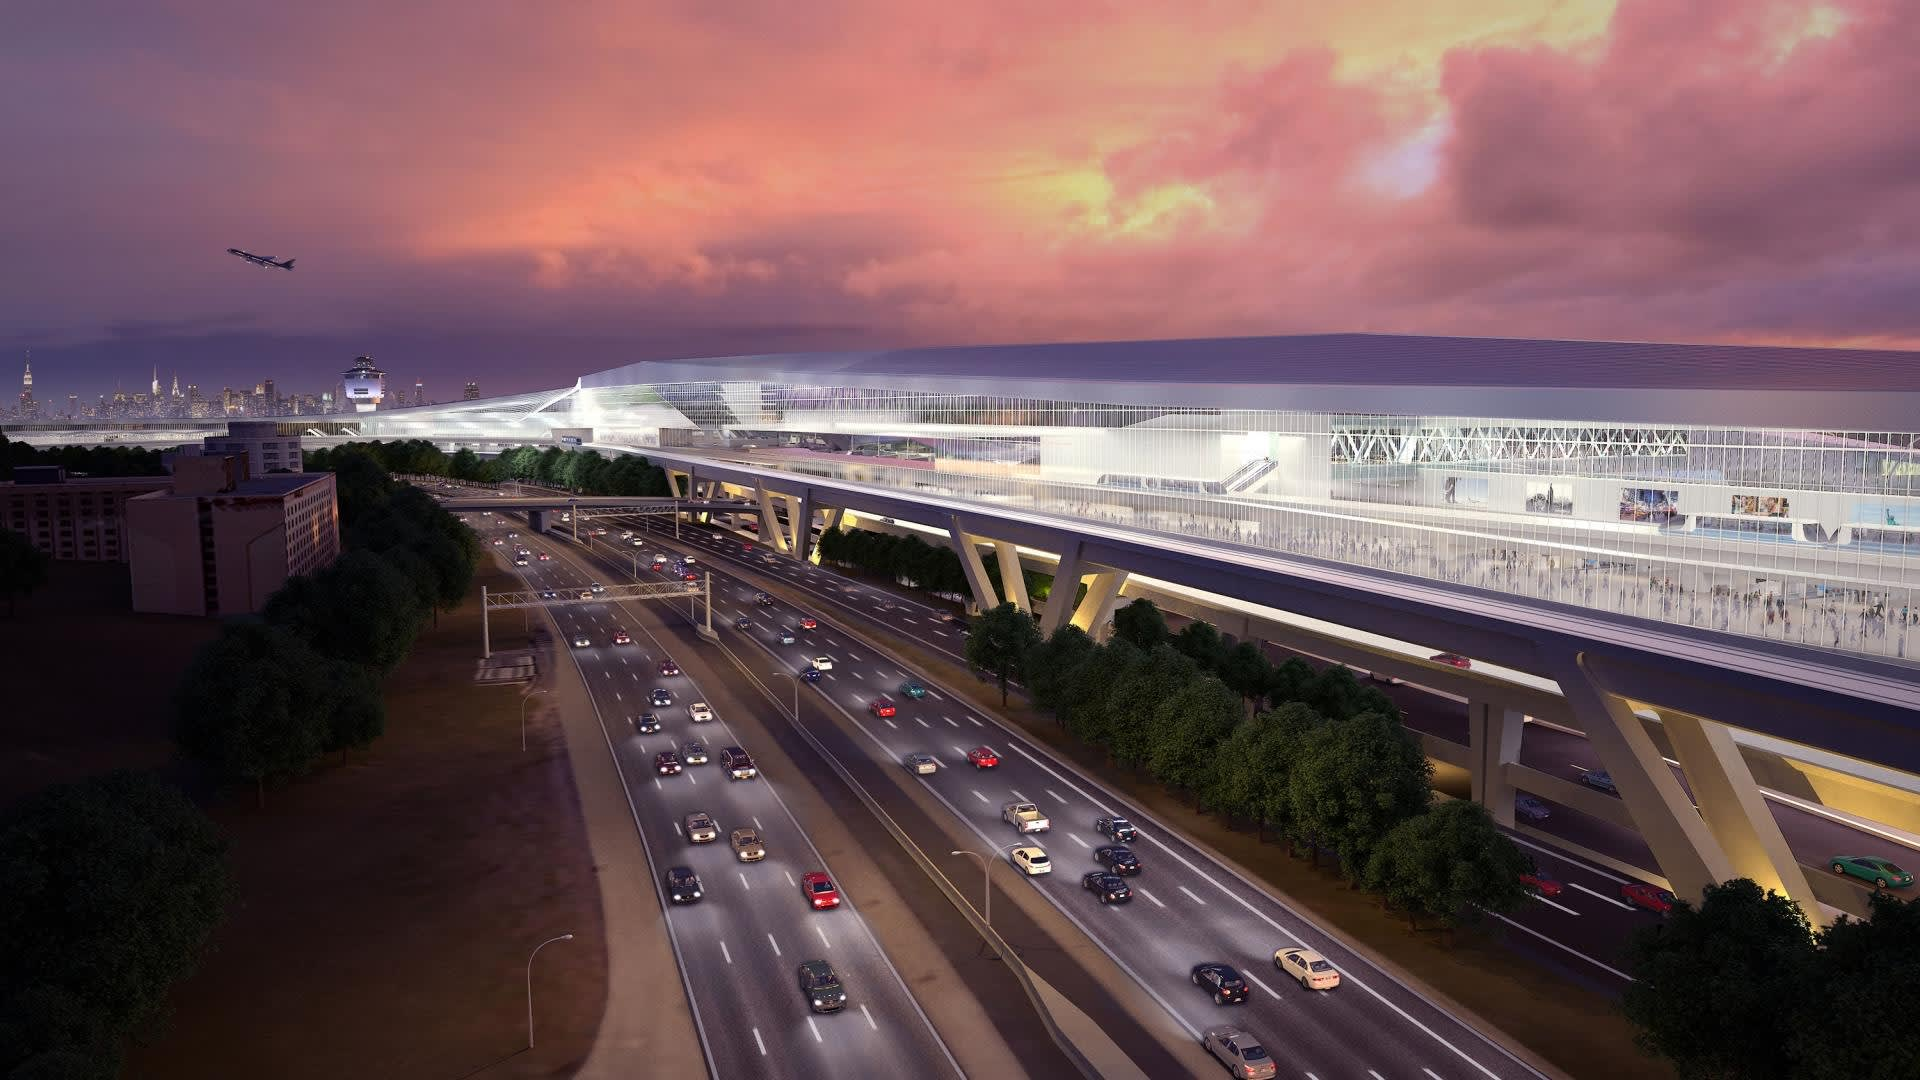 مطار لاغوارديا في نيويورك